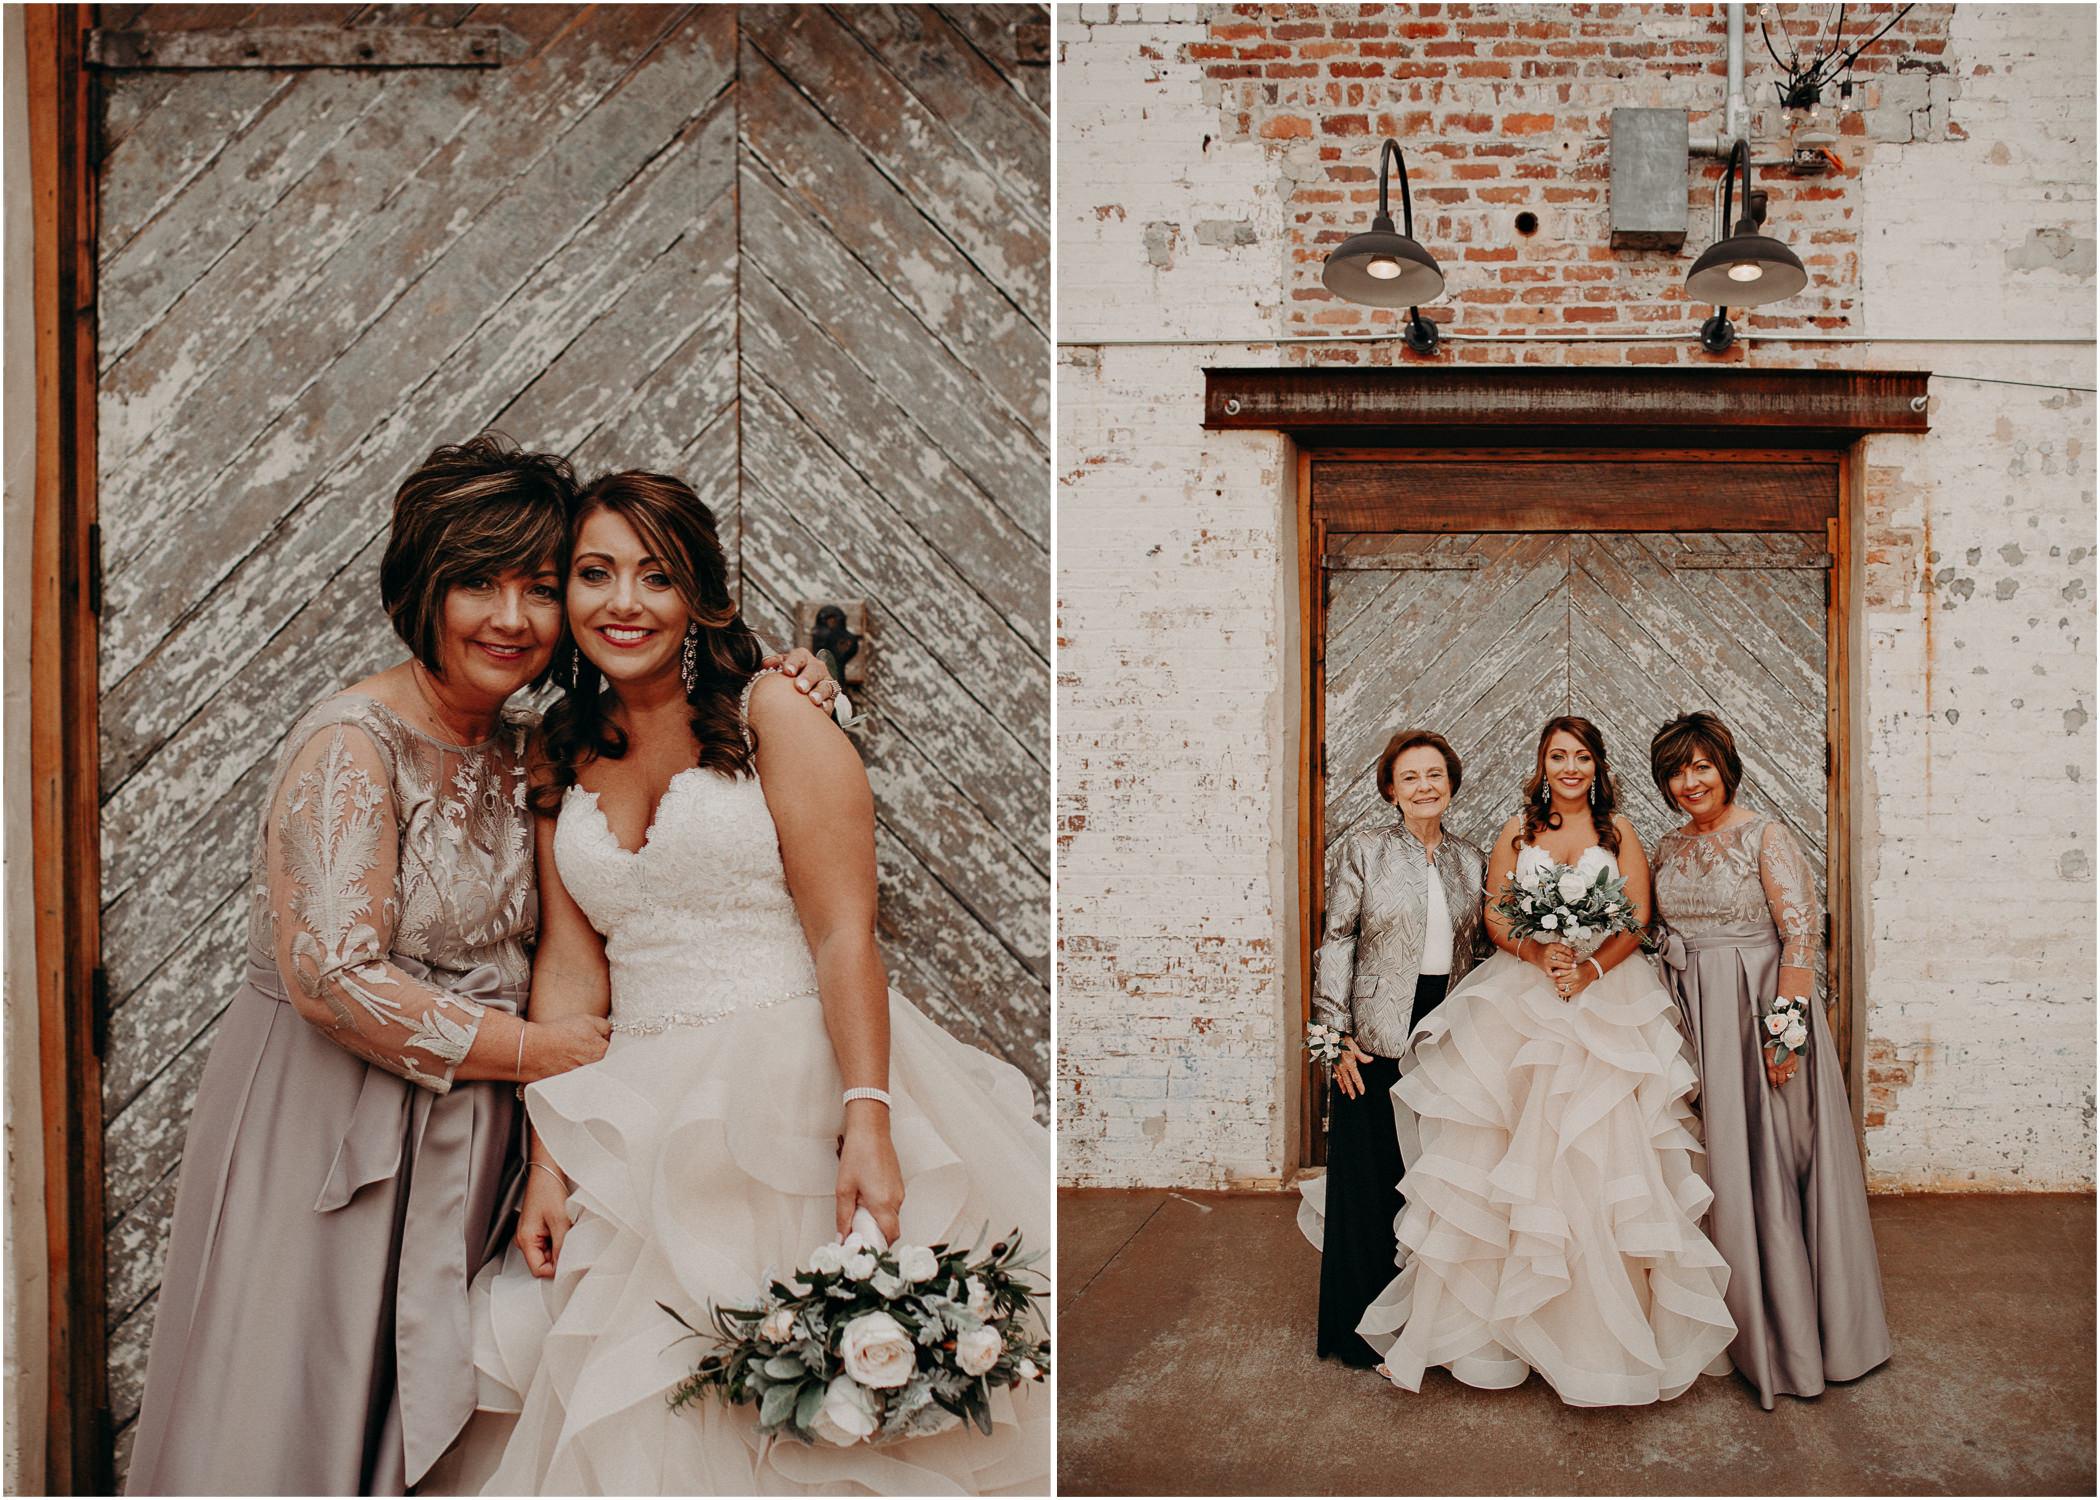 24 4 - Atlanta Wedding Photographer - The engine room - Ga - Wedding trends - Aline Marin Photography.jpg